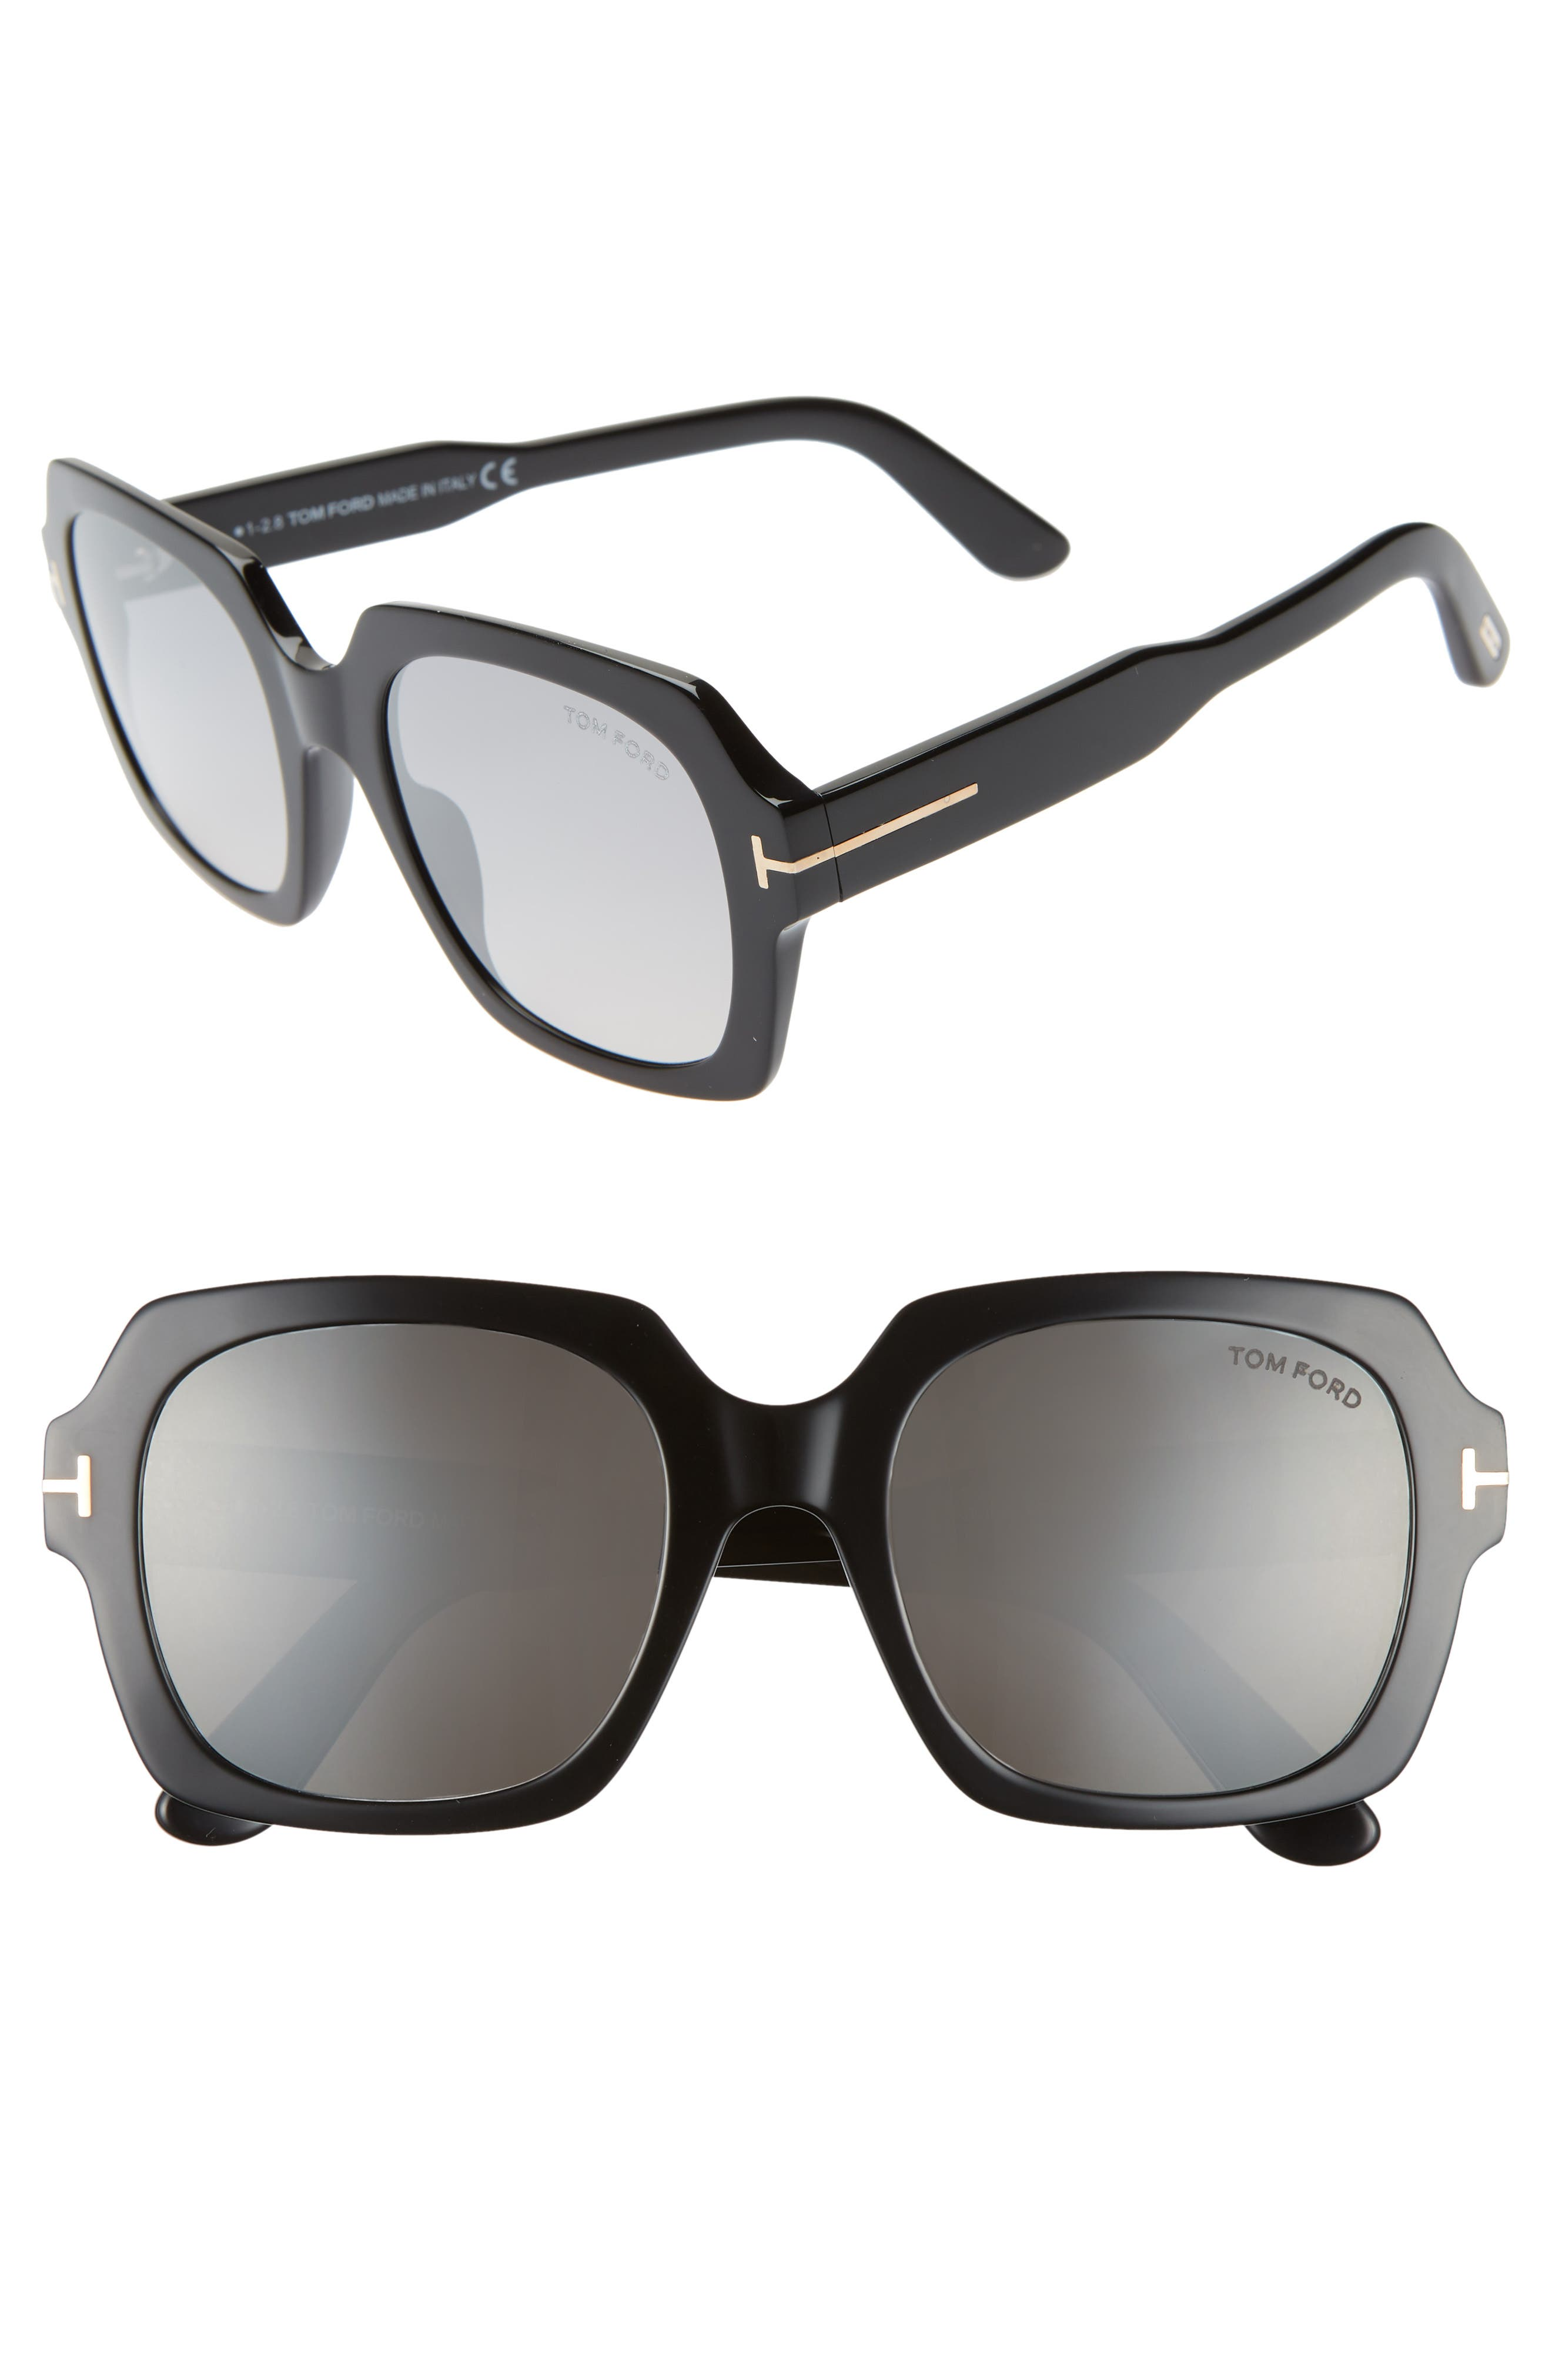 Autumn 53mm Square Sunglasses,                             Main thumbnail 1, color,                             BLACK/ SMOKE/ SILVER FLASH